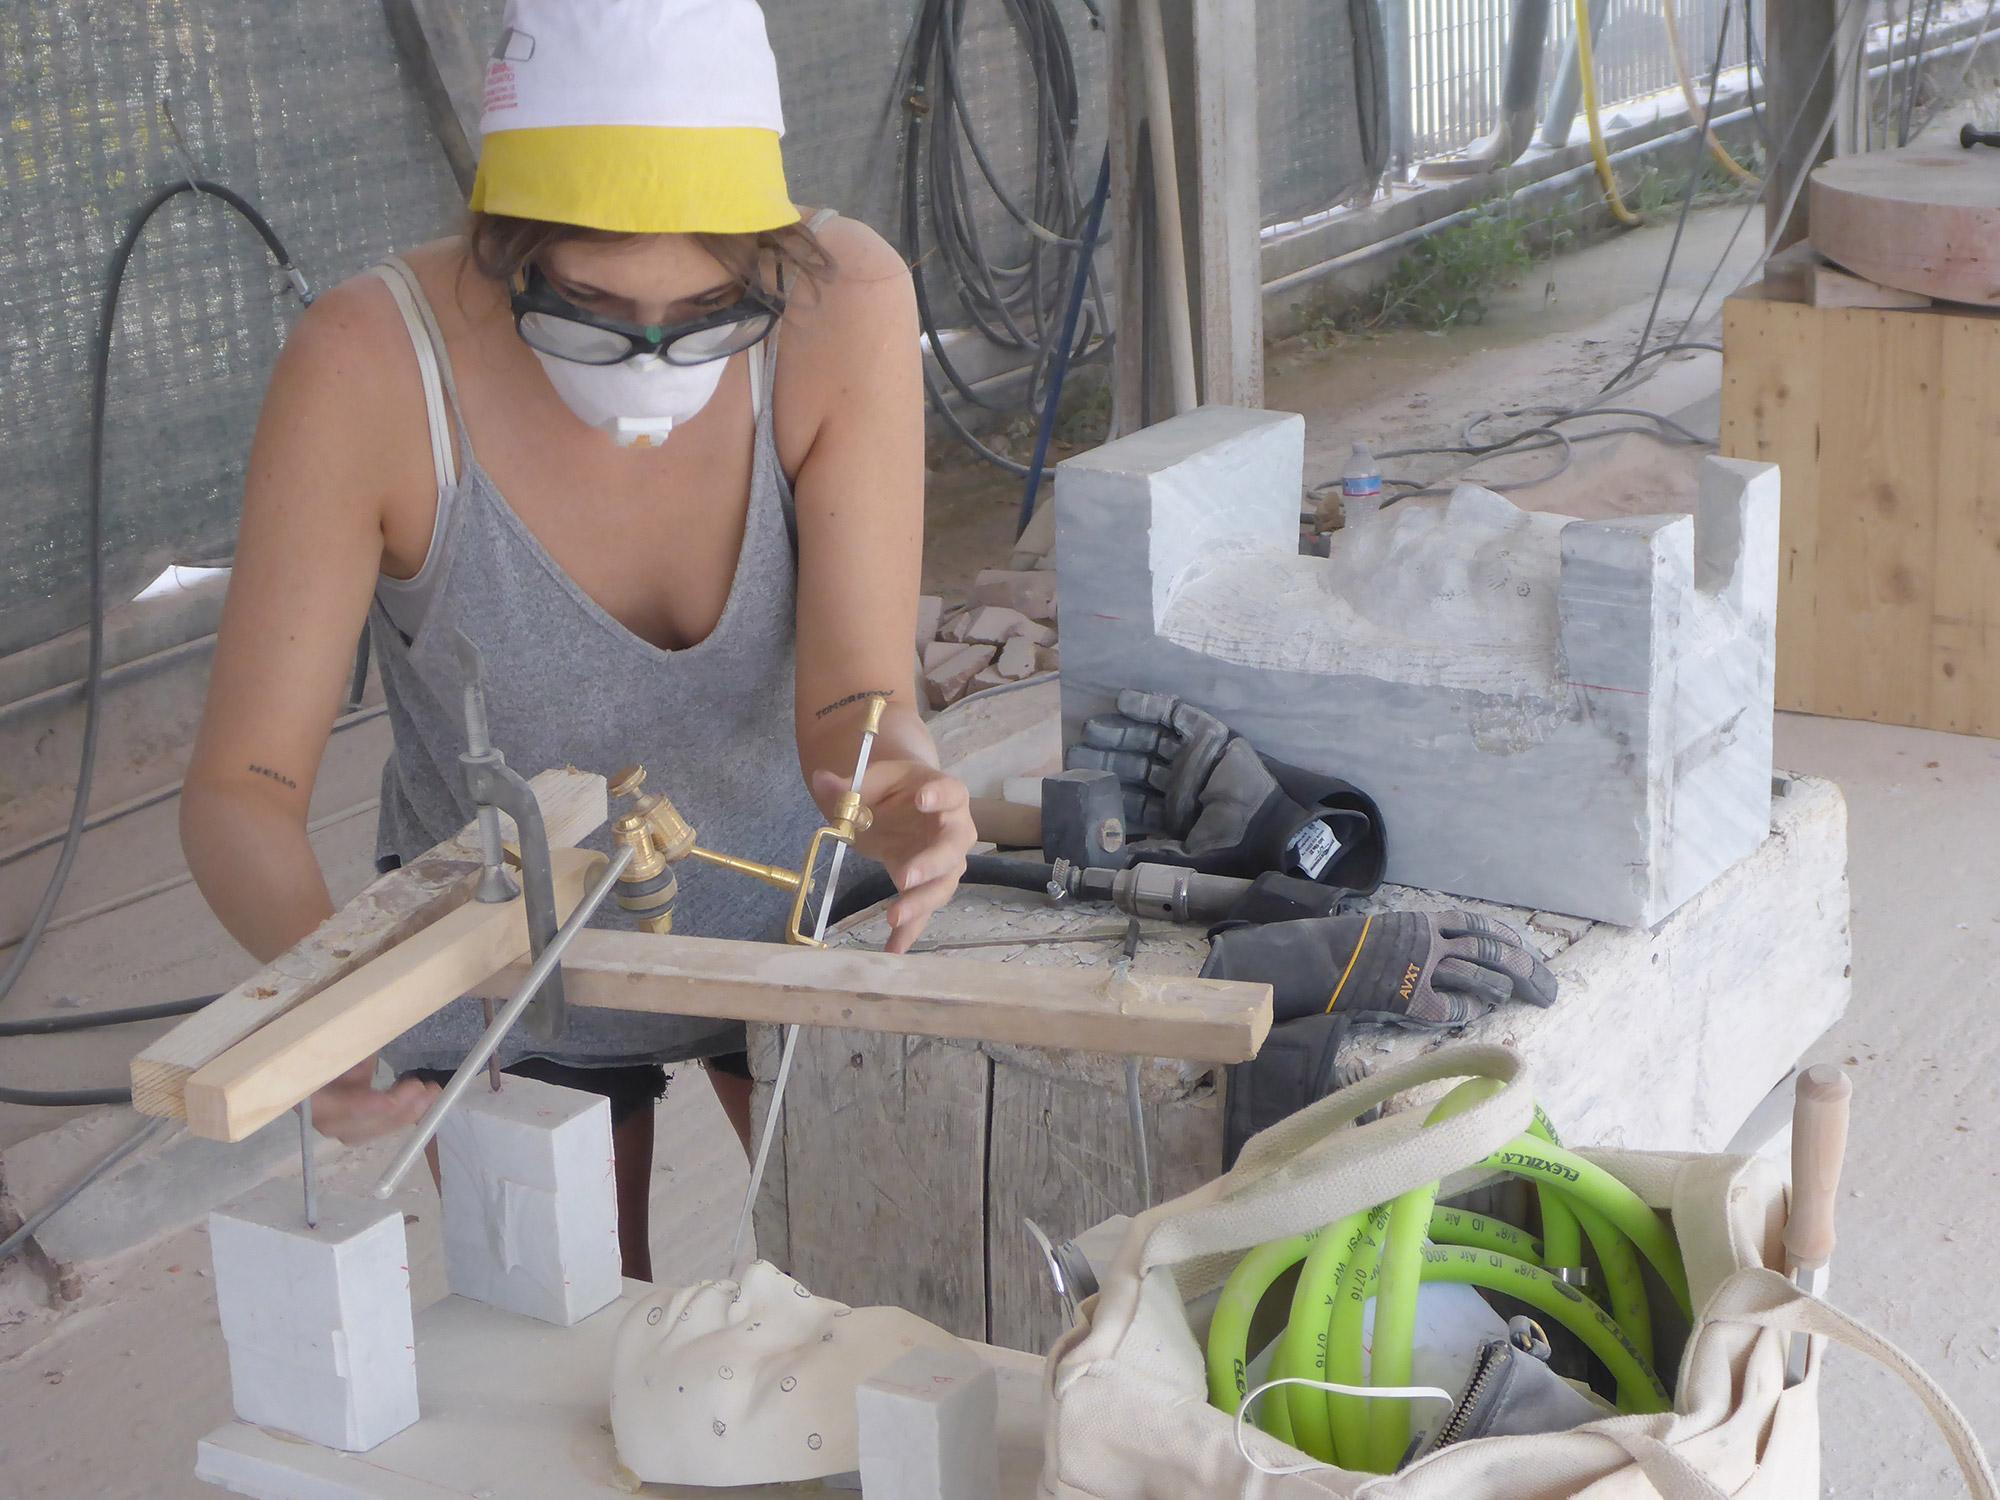 Mary-Beth-Gutkowski-Sculpture-Residency-Amelia-Kate-Sampson-and-Elizabeth-Hardy20171213_0206.jpg